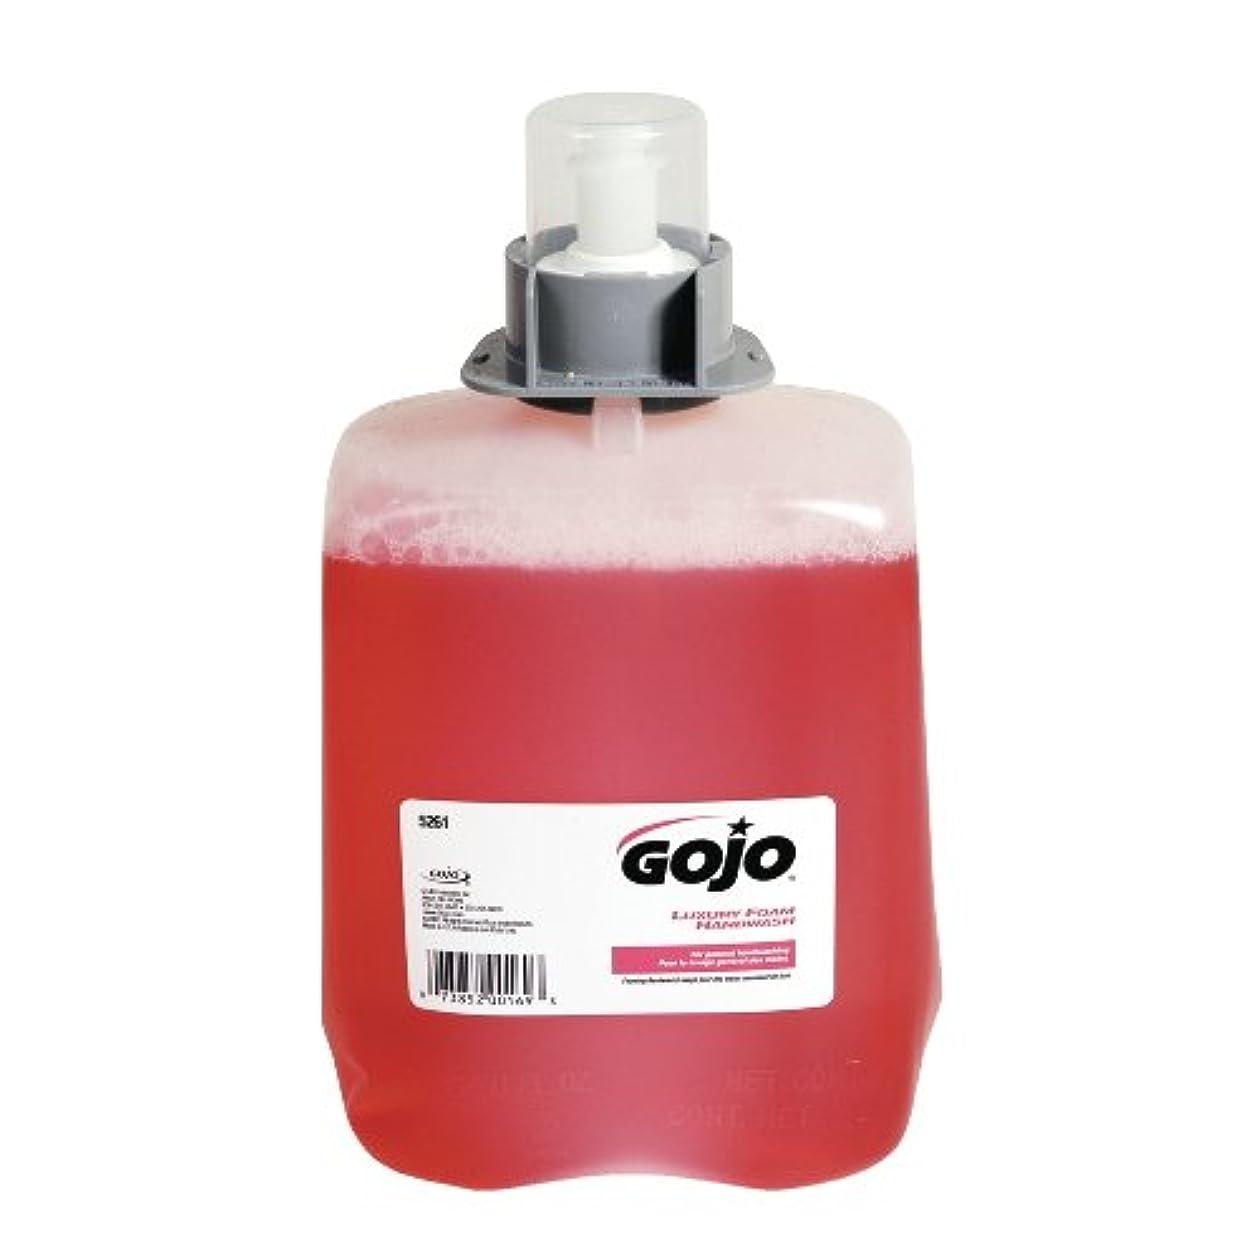 GOJ526102 - Gojo Luxury Foam Hand Wash Refill for FMX-20 Dispenser by Gojo